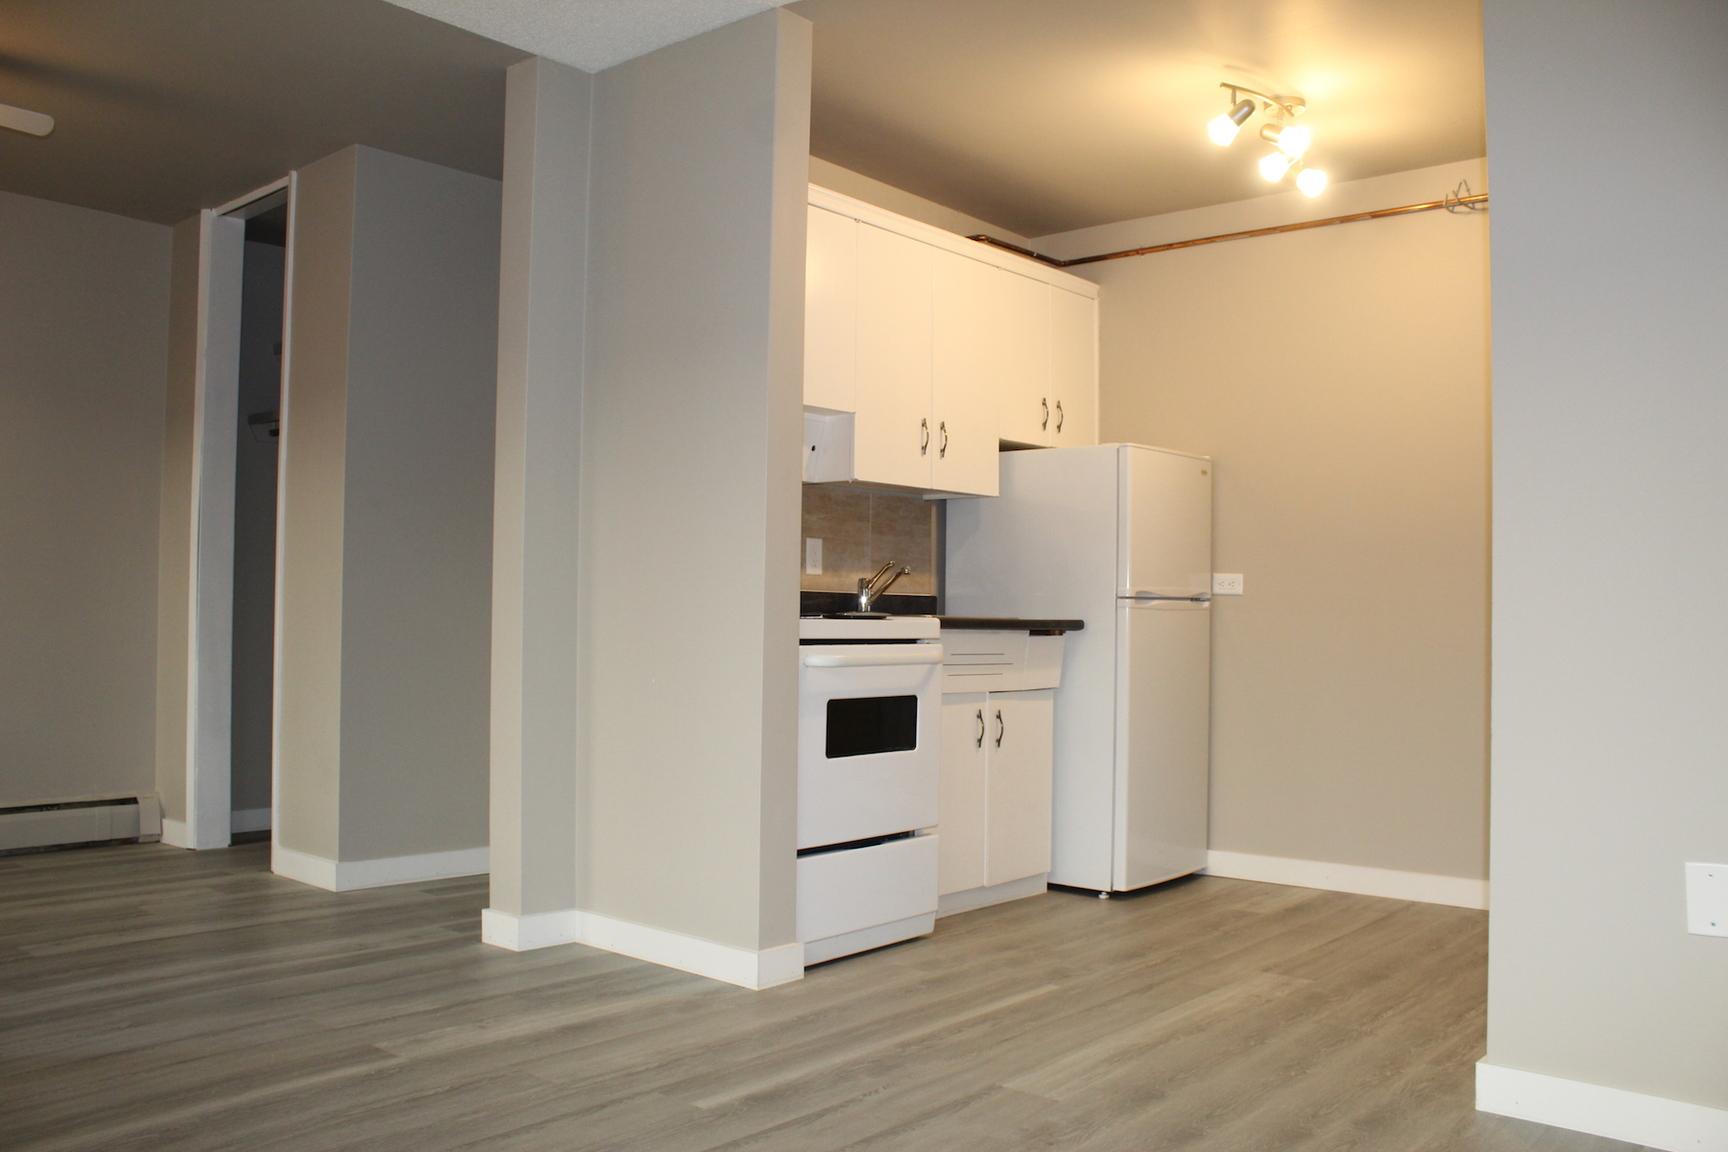 10735 107 St NW, Edmonton, AB - $825 CAD/ month